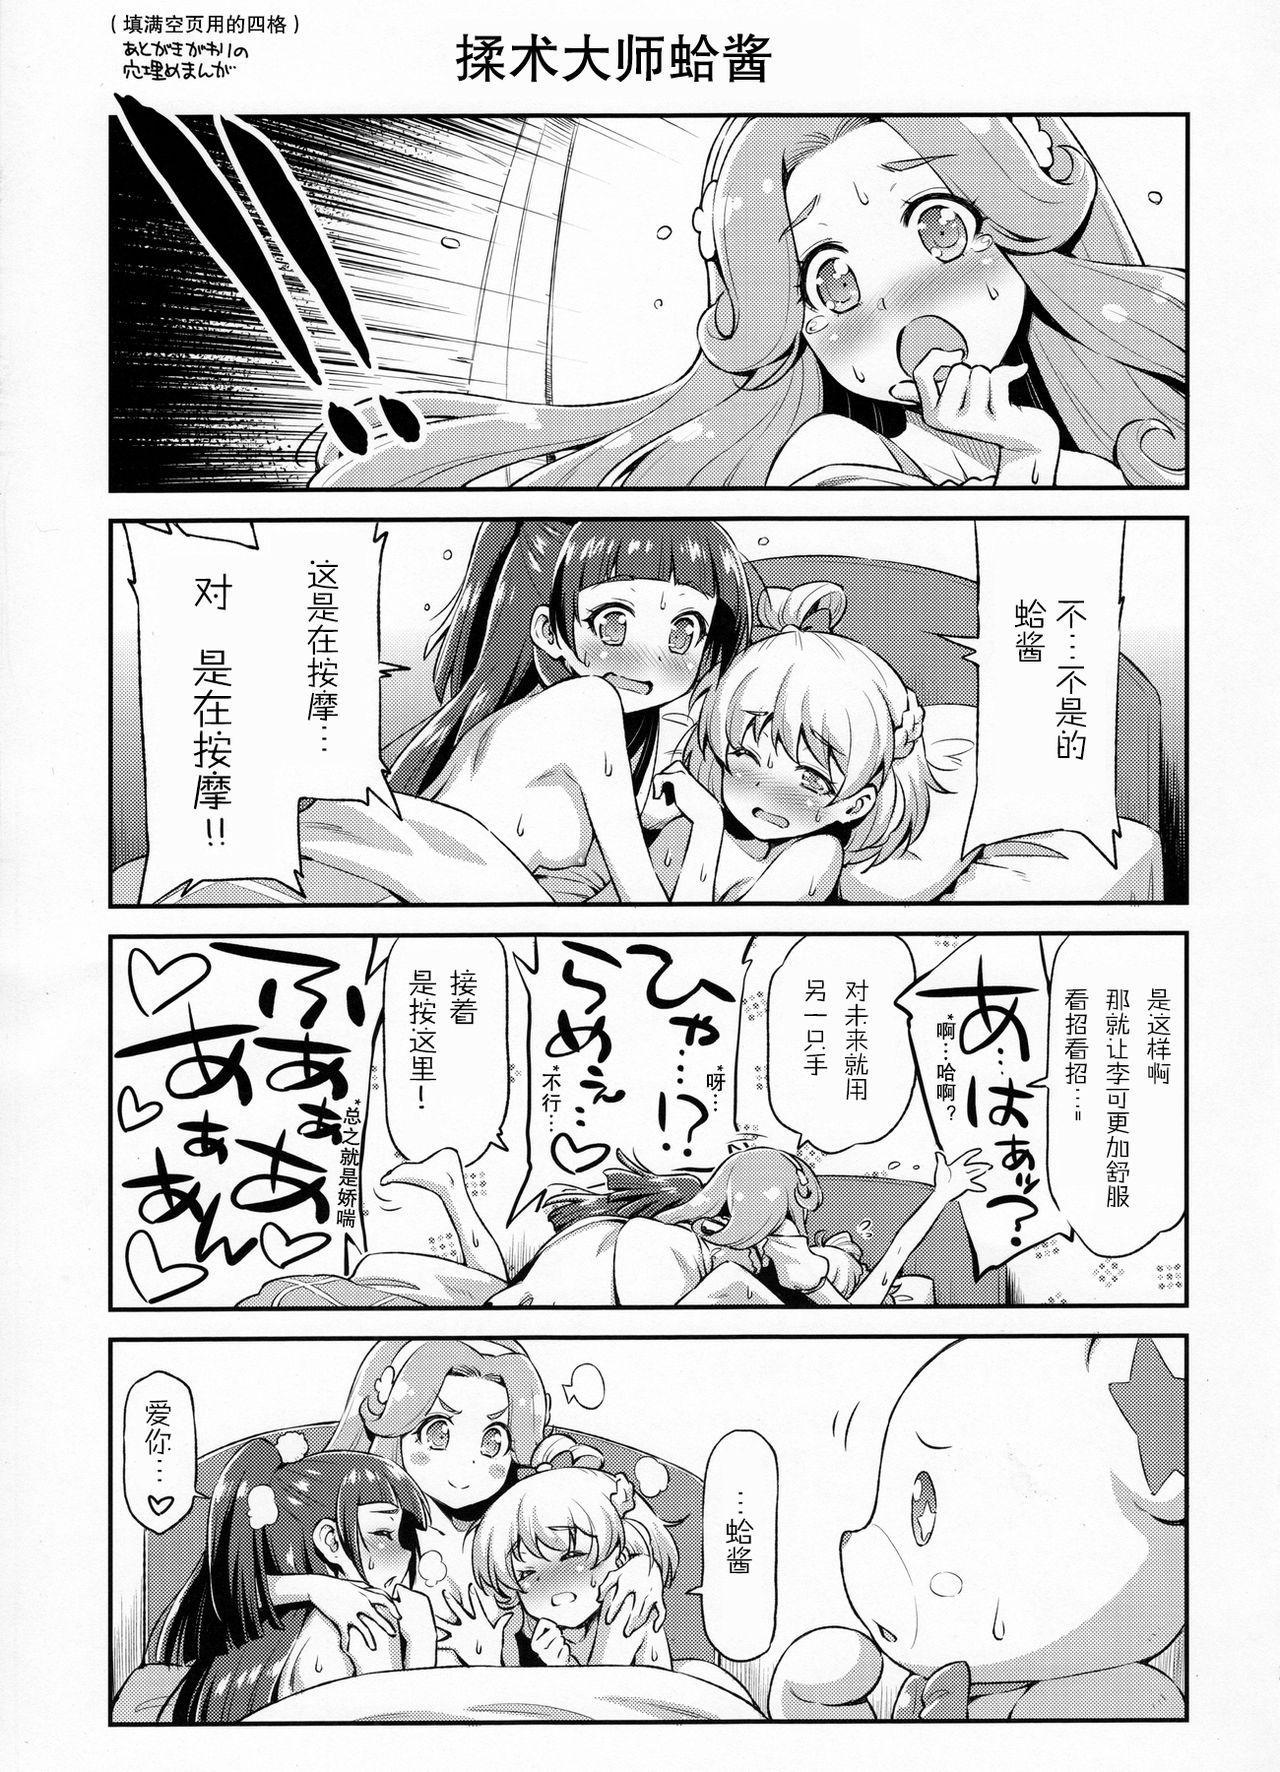 (C91) [ACID EATERS (Kazuma Muramasa)] Haa-chan to Furo ni Haireba. (Mahou Tsukai Precure!)(Chinese) 24